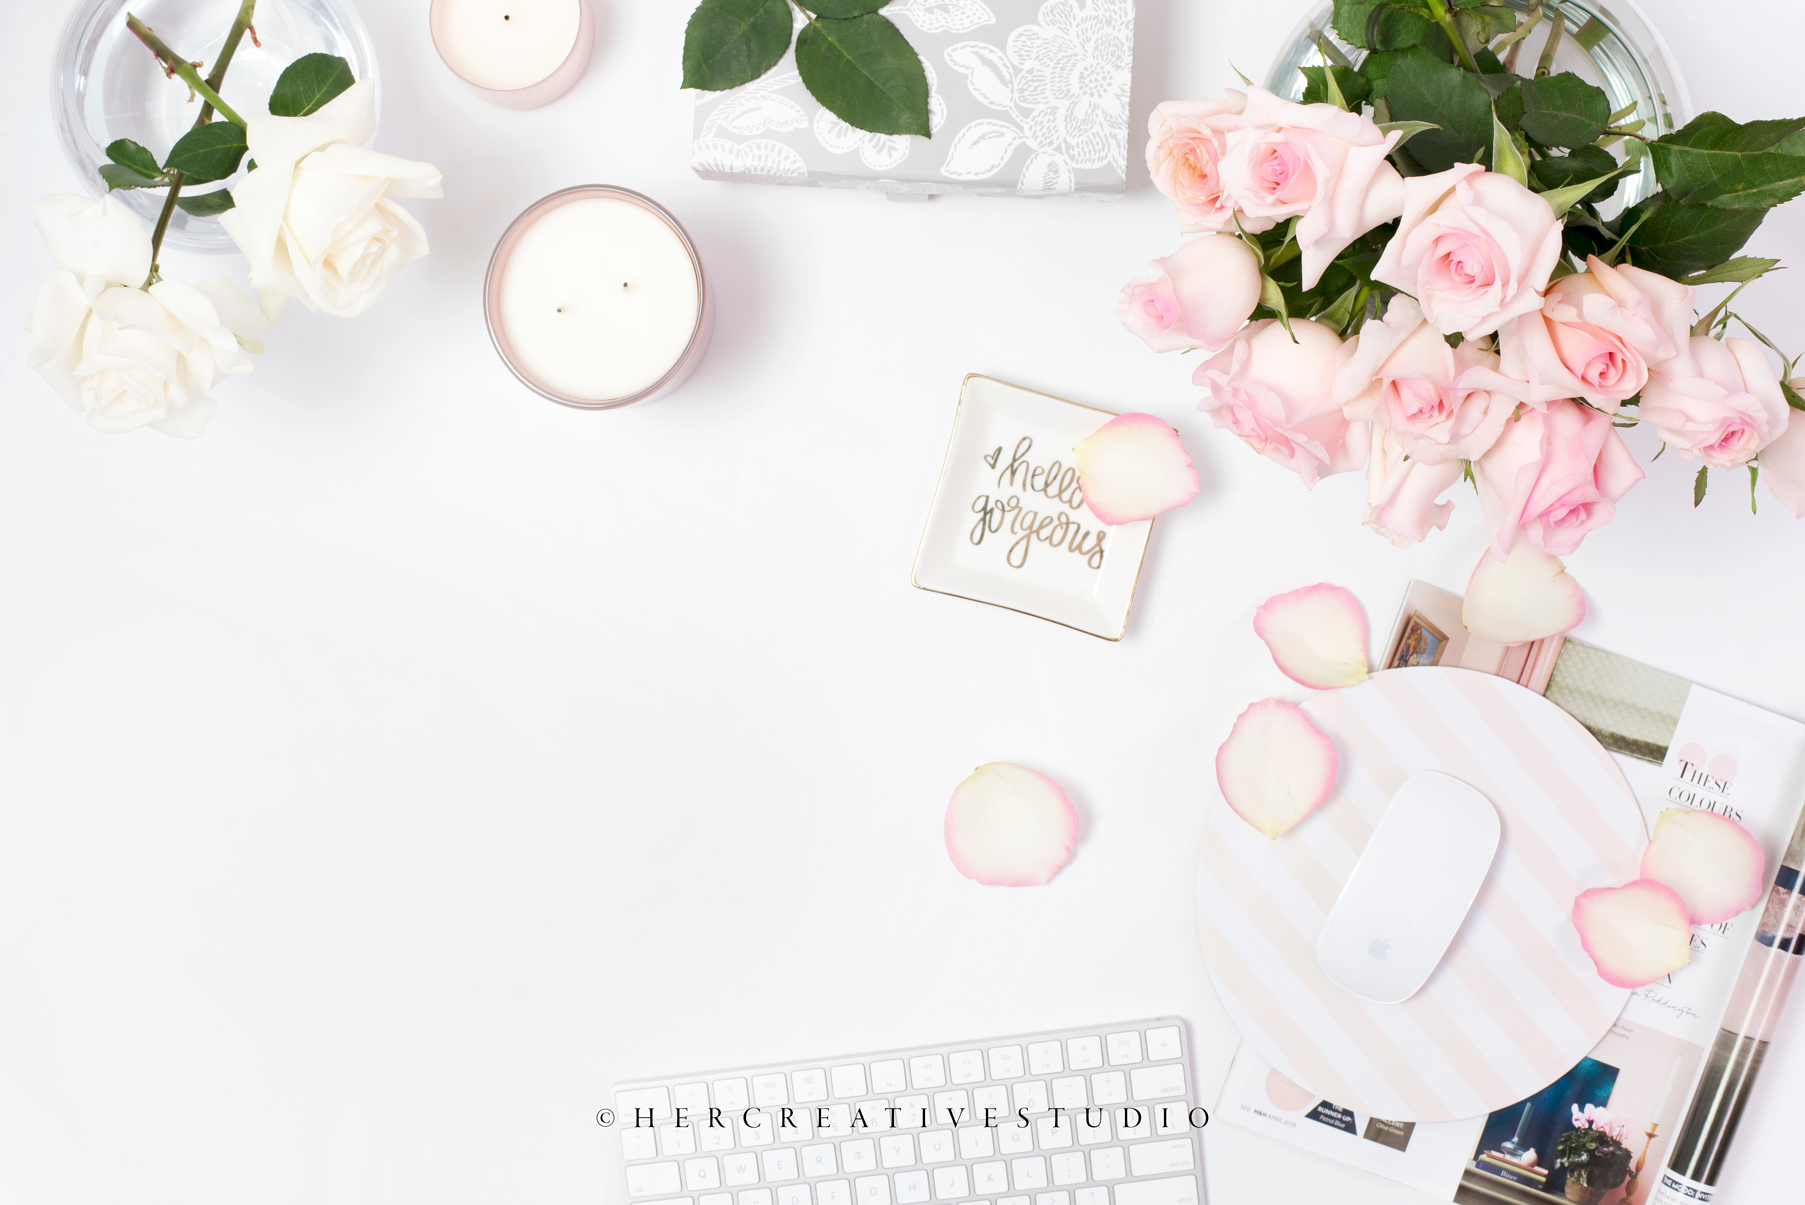 57615011 Styled Desktop, Roses & Desk Accessories — Her Creative Studio